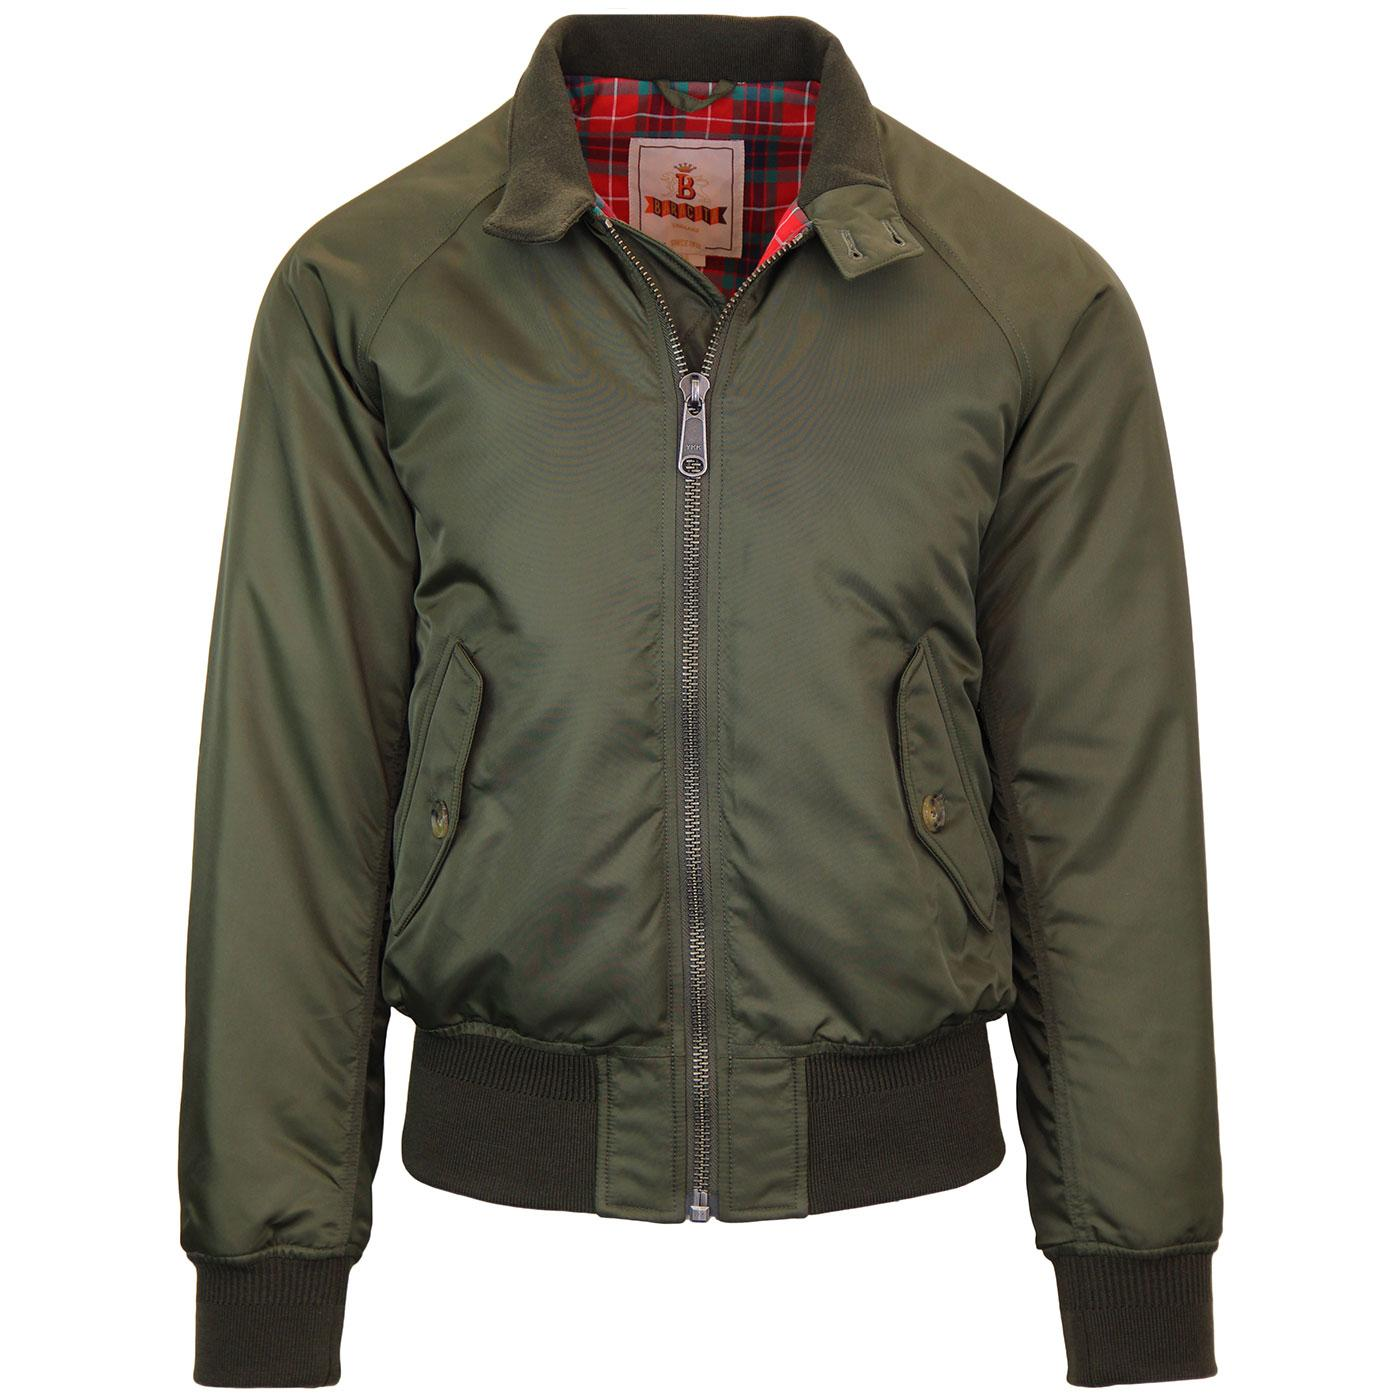 BARACUTA G9 Winter Flight Harrington Jacket BEECH